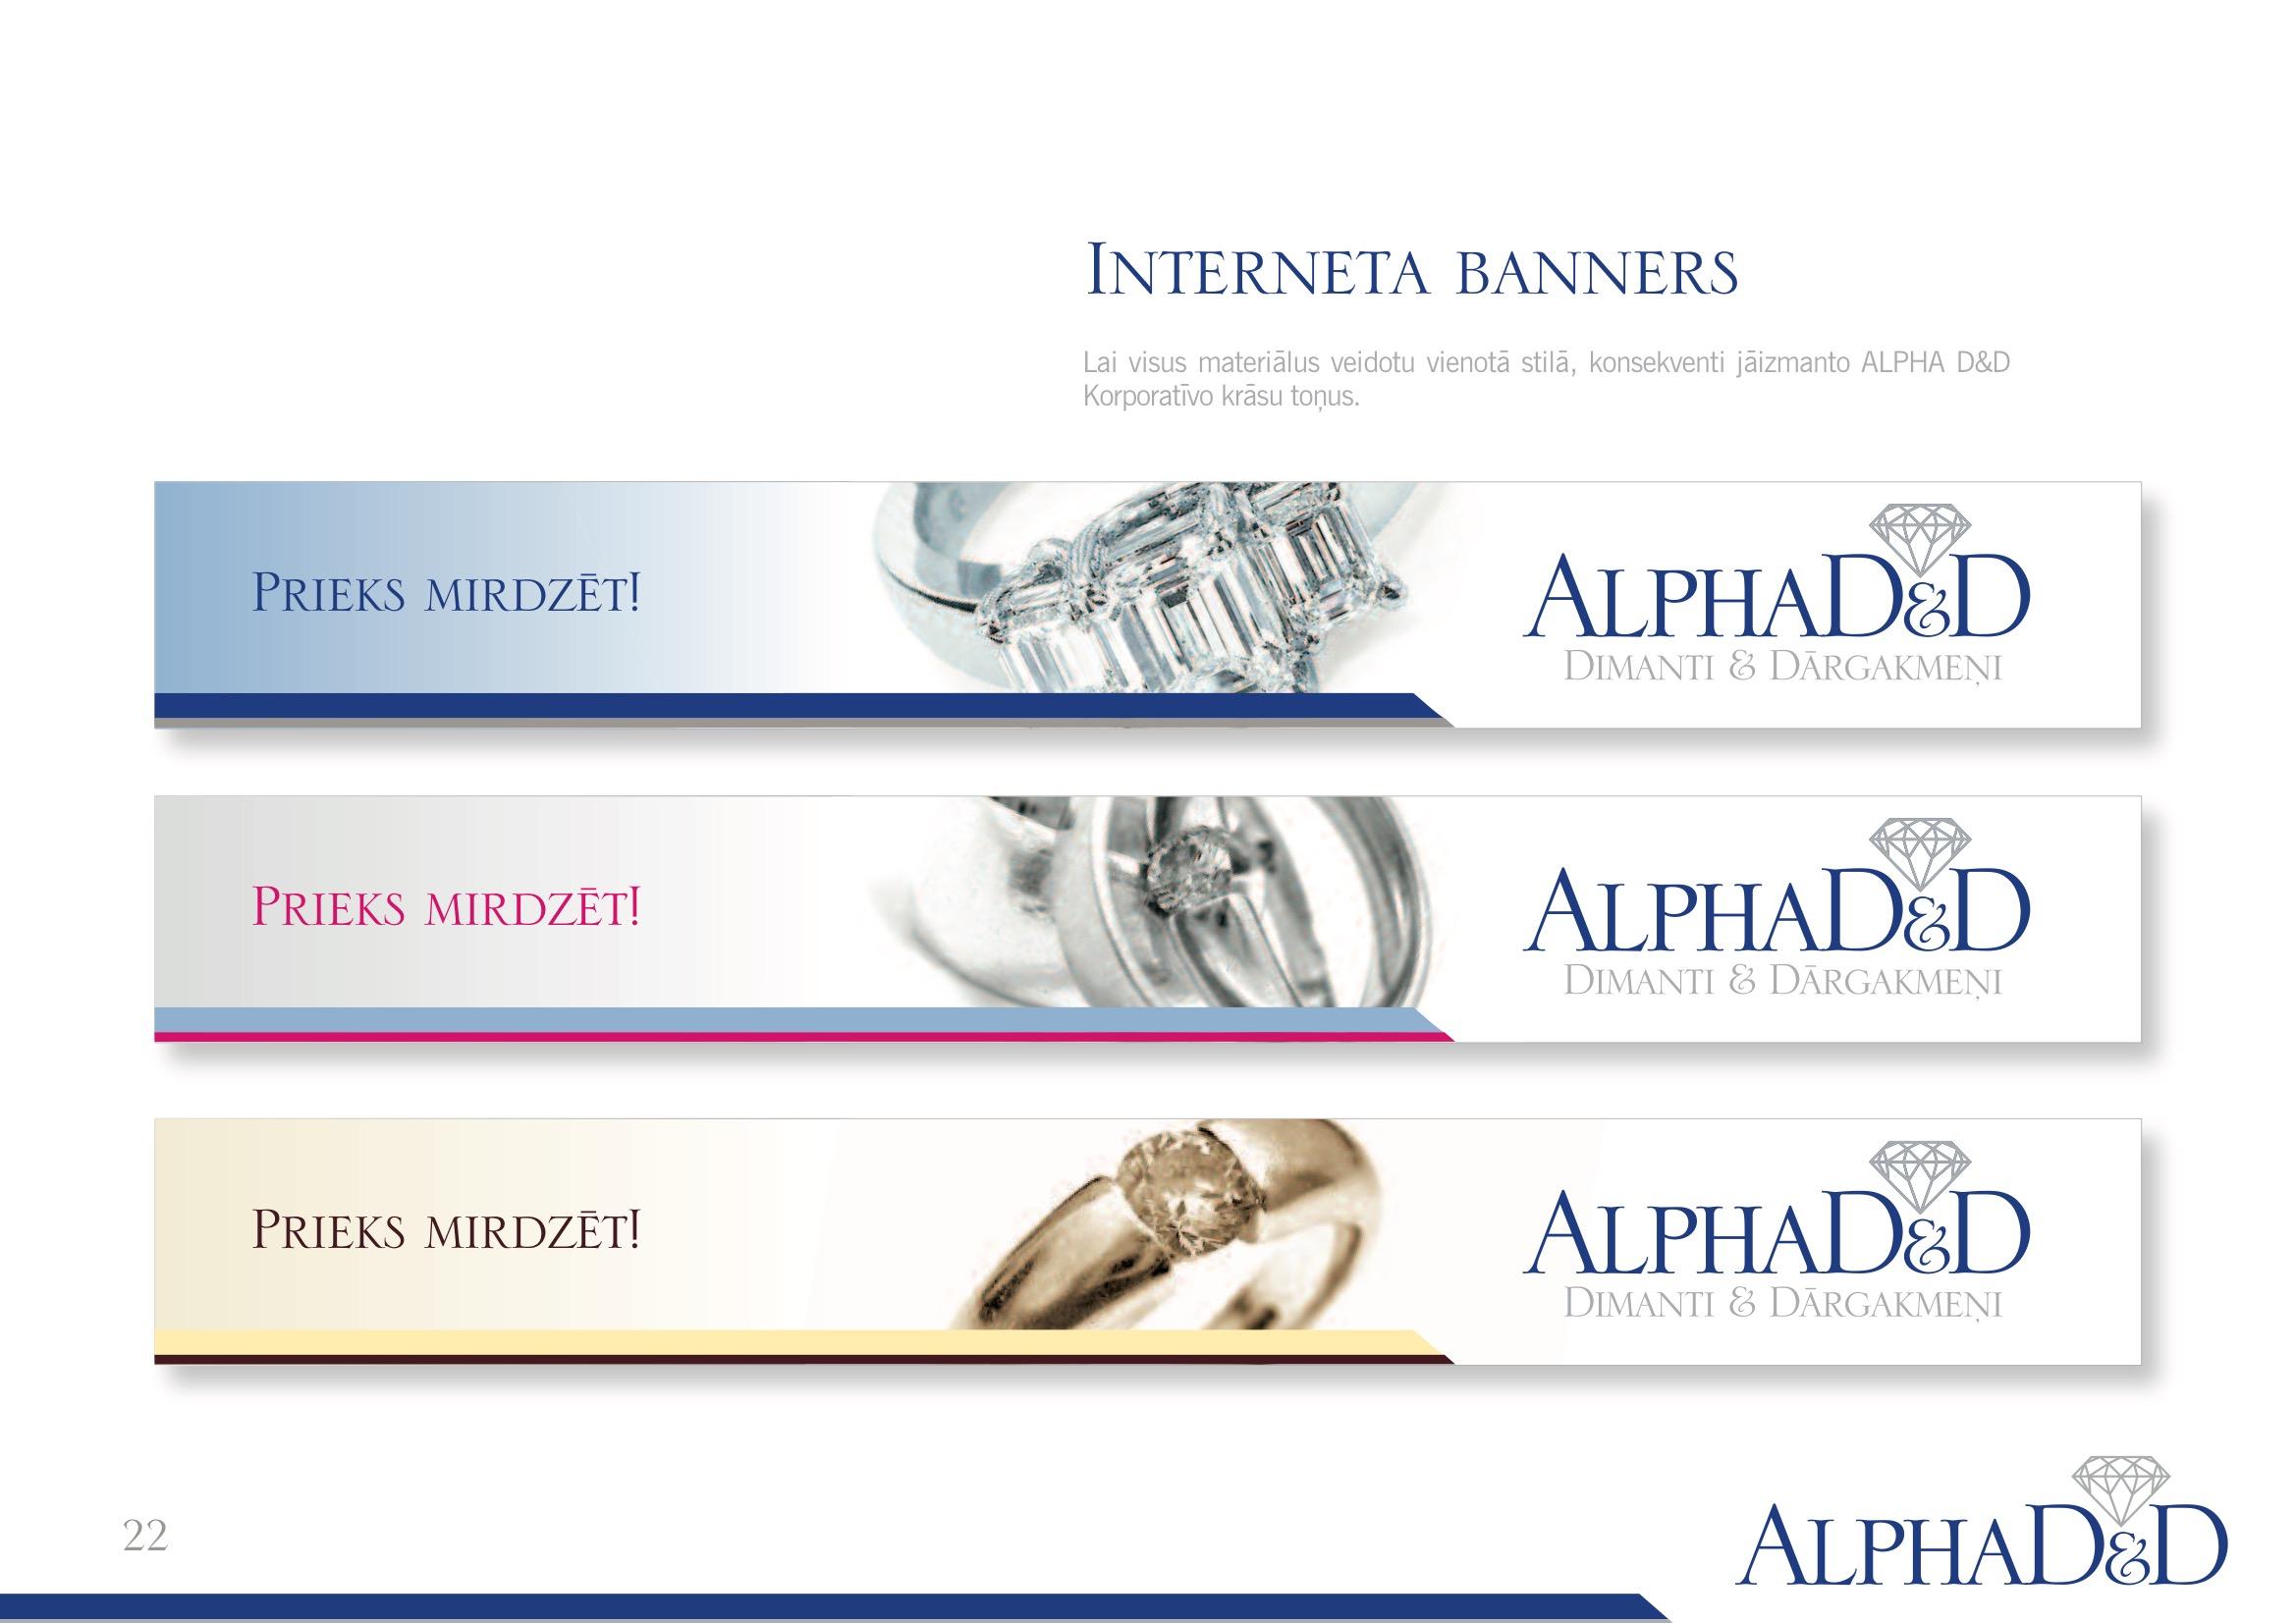 AlphaDD_Stils 22